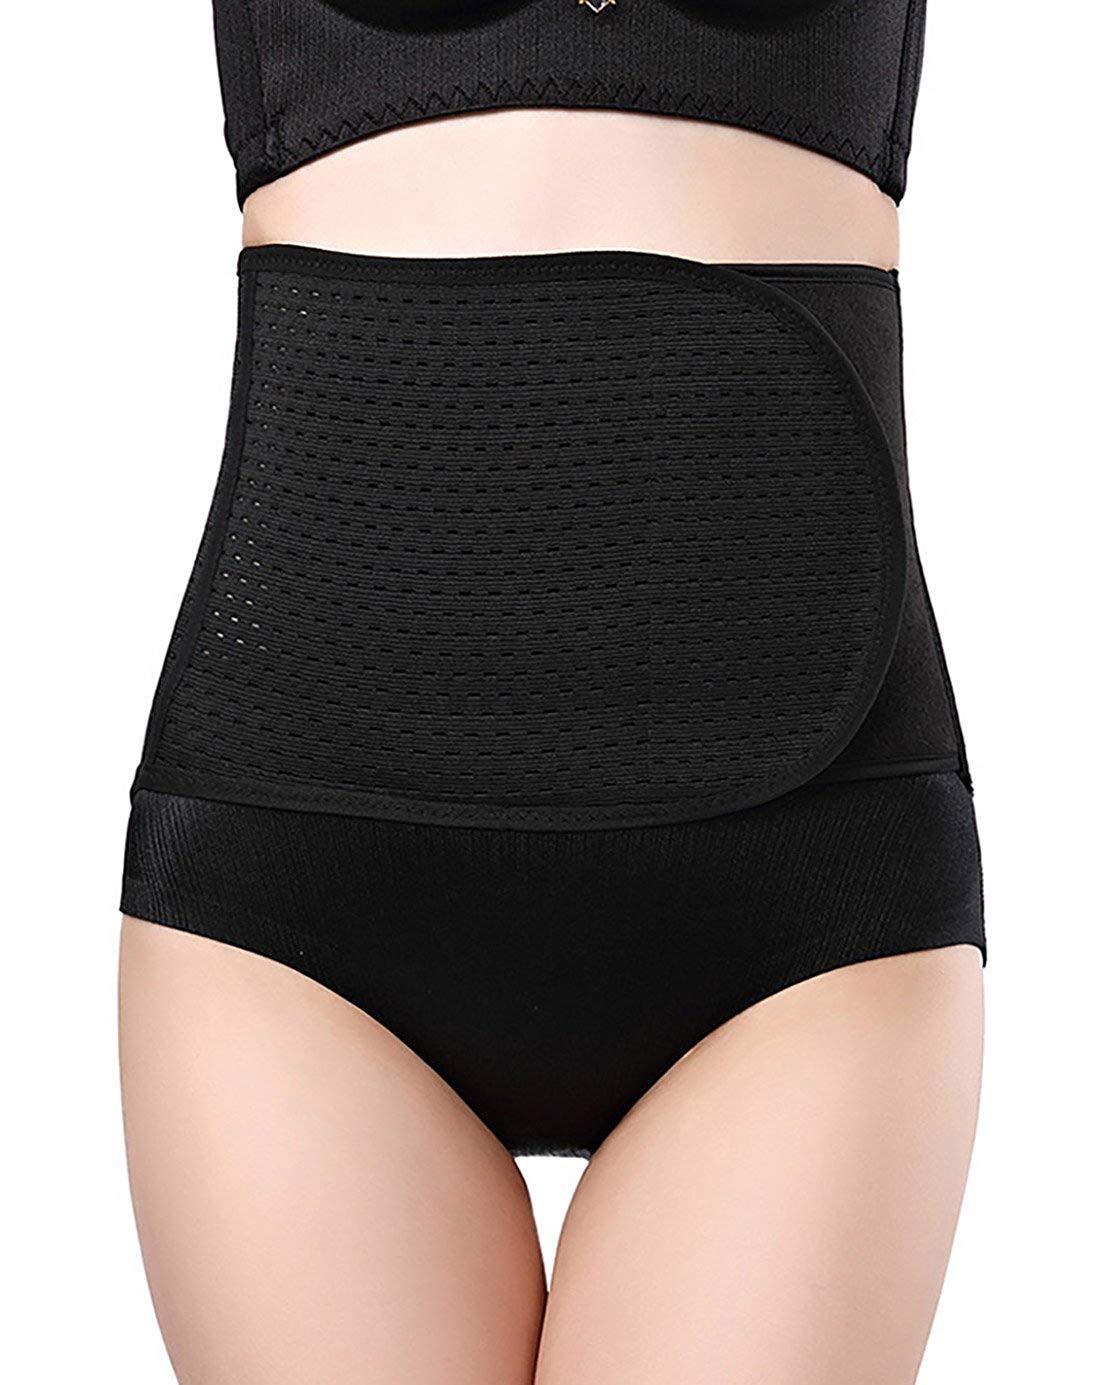 2c91b70ec Get Quotations · Aivtalk Women s Postnatal Recoery Belly Waist Trainer  Breathable Girdle Belt Slimming Fat Burner Body Shaper